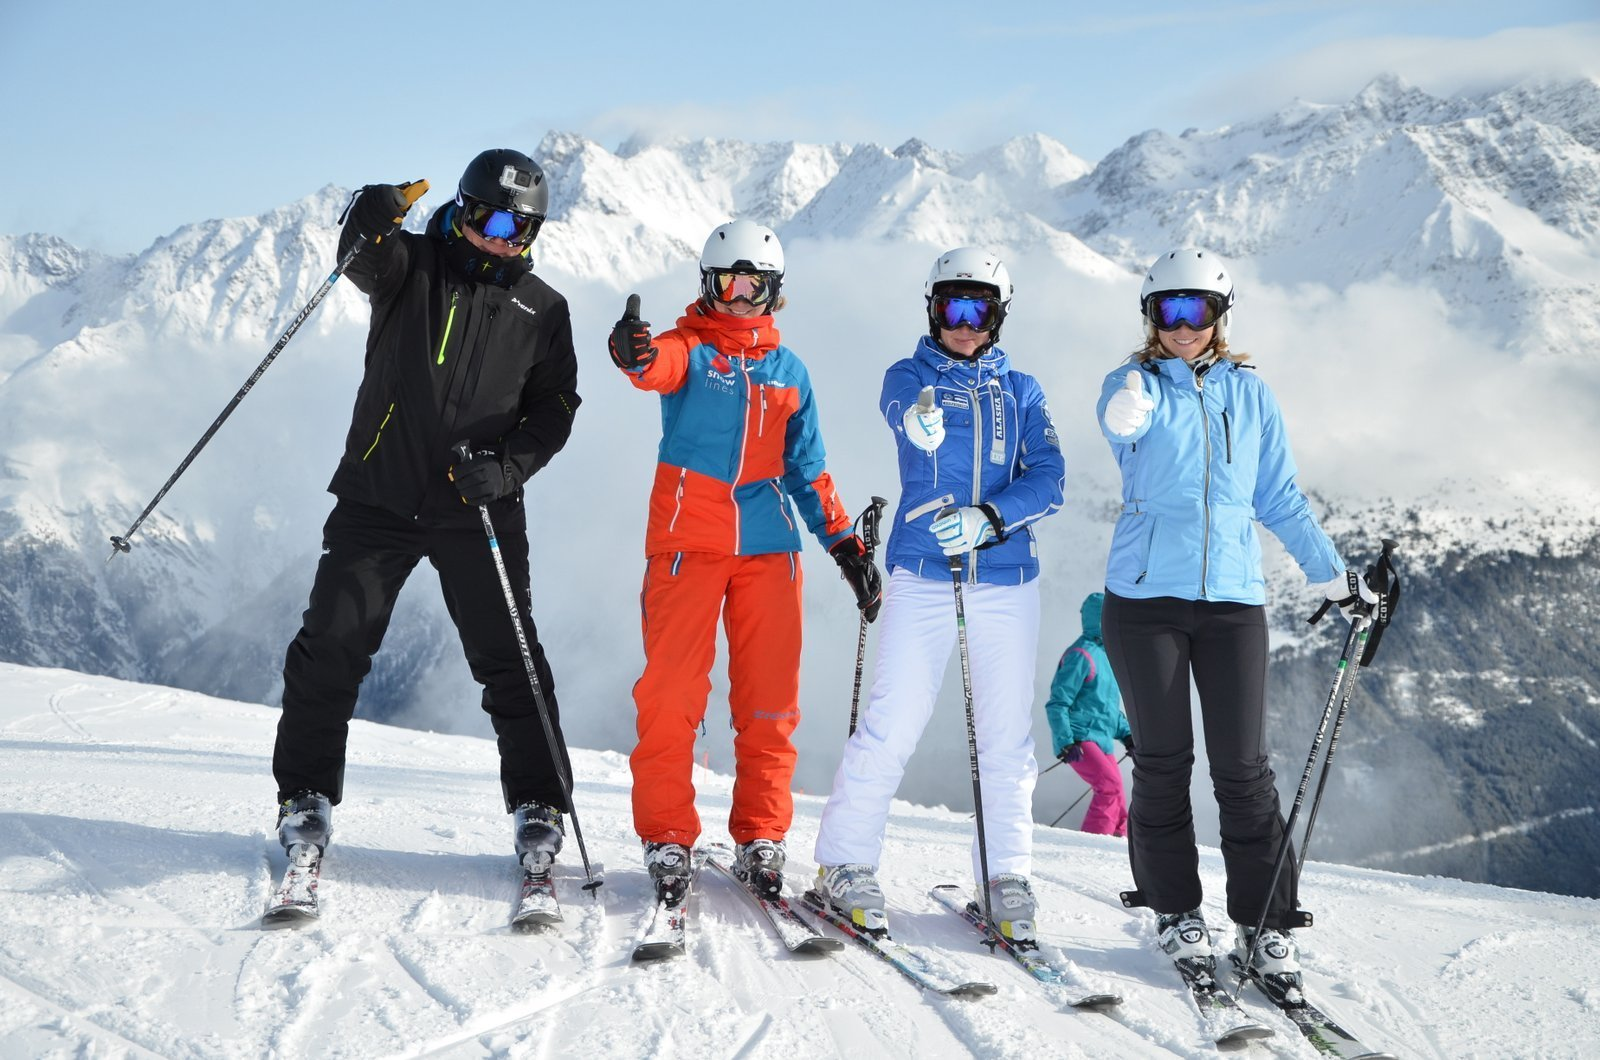 Ski Tour - Premium